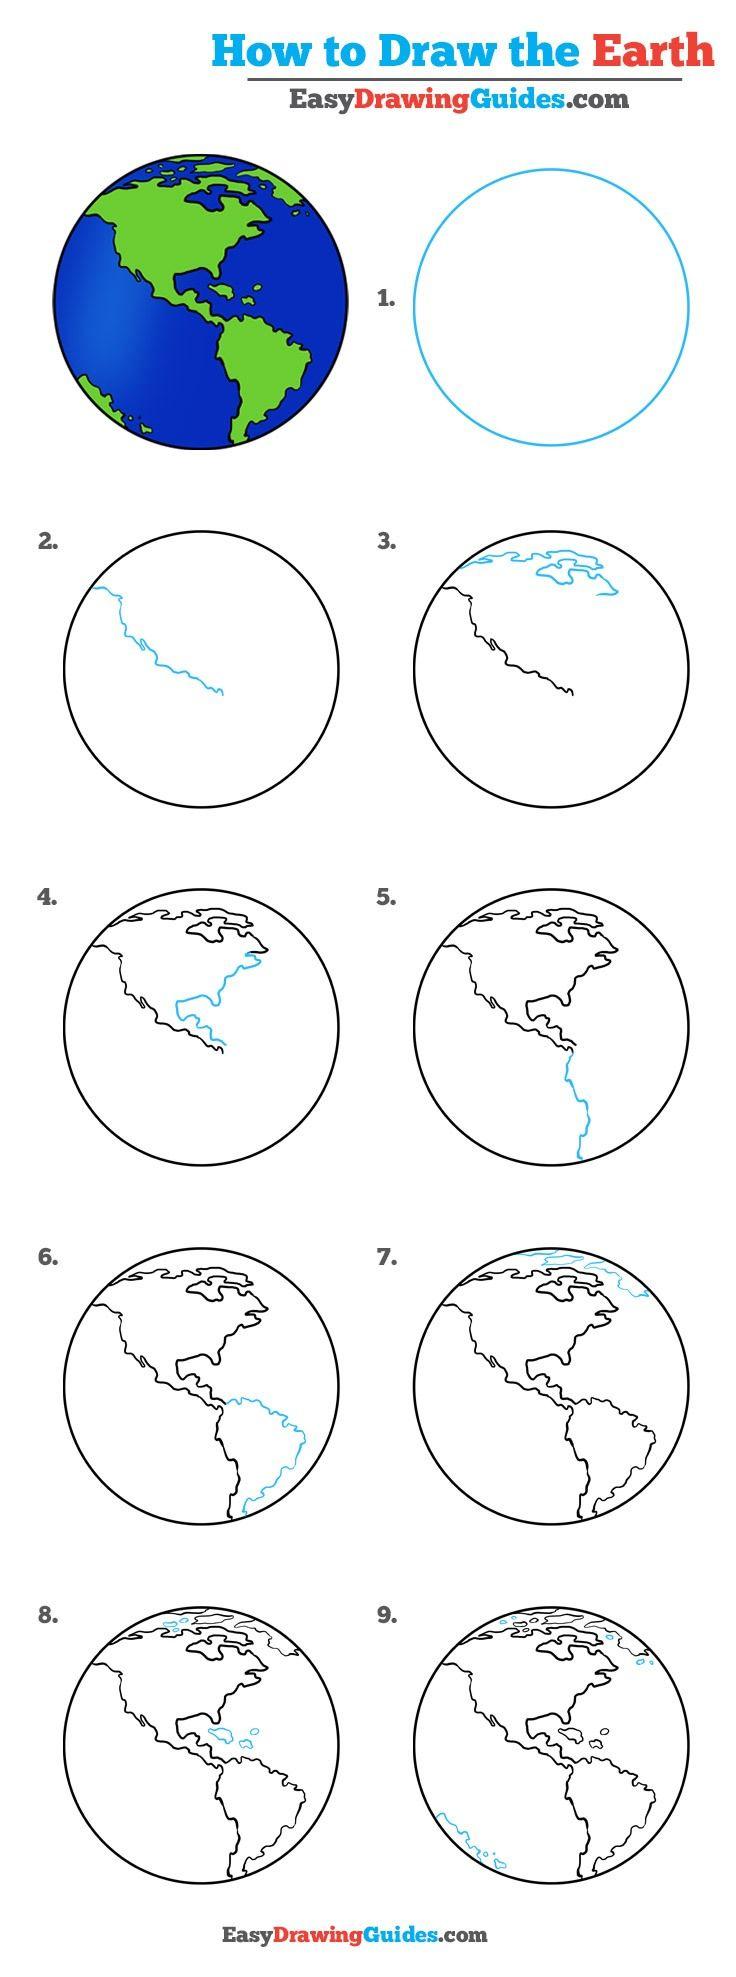 Comment Dessiner La Terre : comment, dessiner, terre, Earth, Really, Drawing, Tutorial, Easy,, Tutorial,, Tutorials